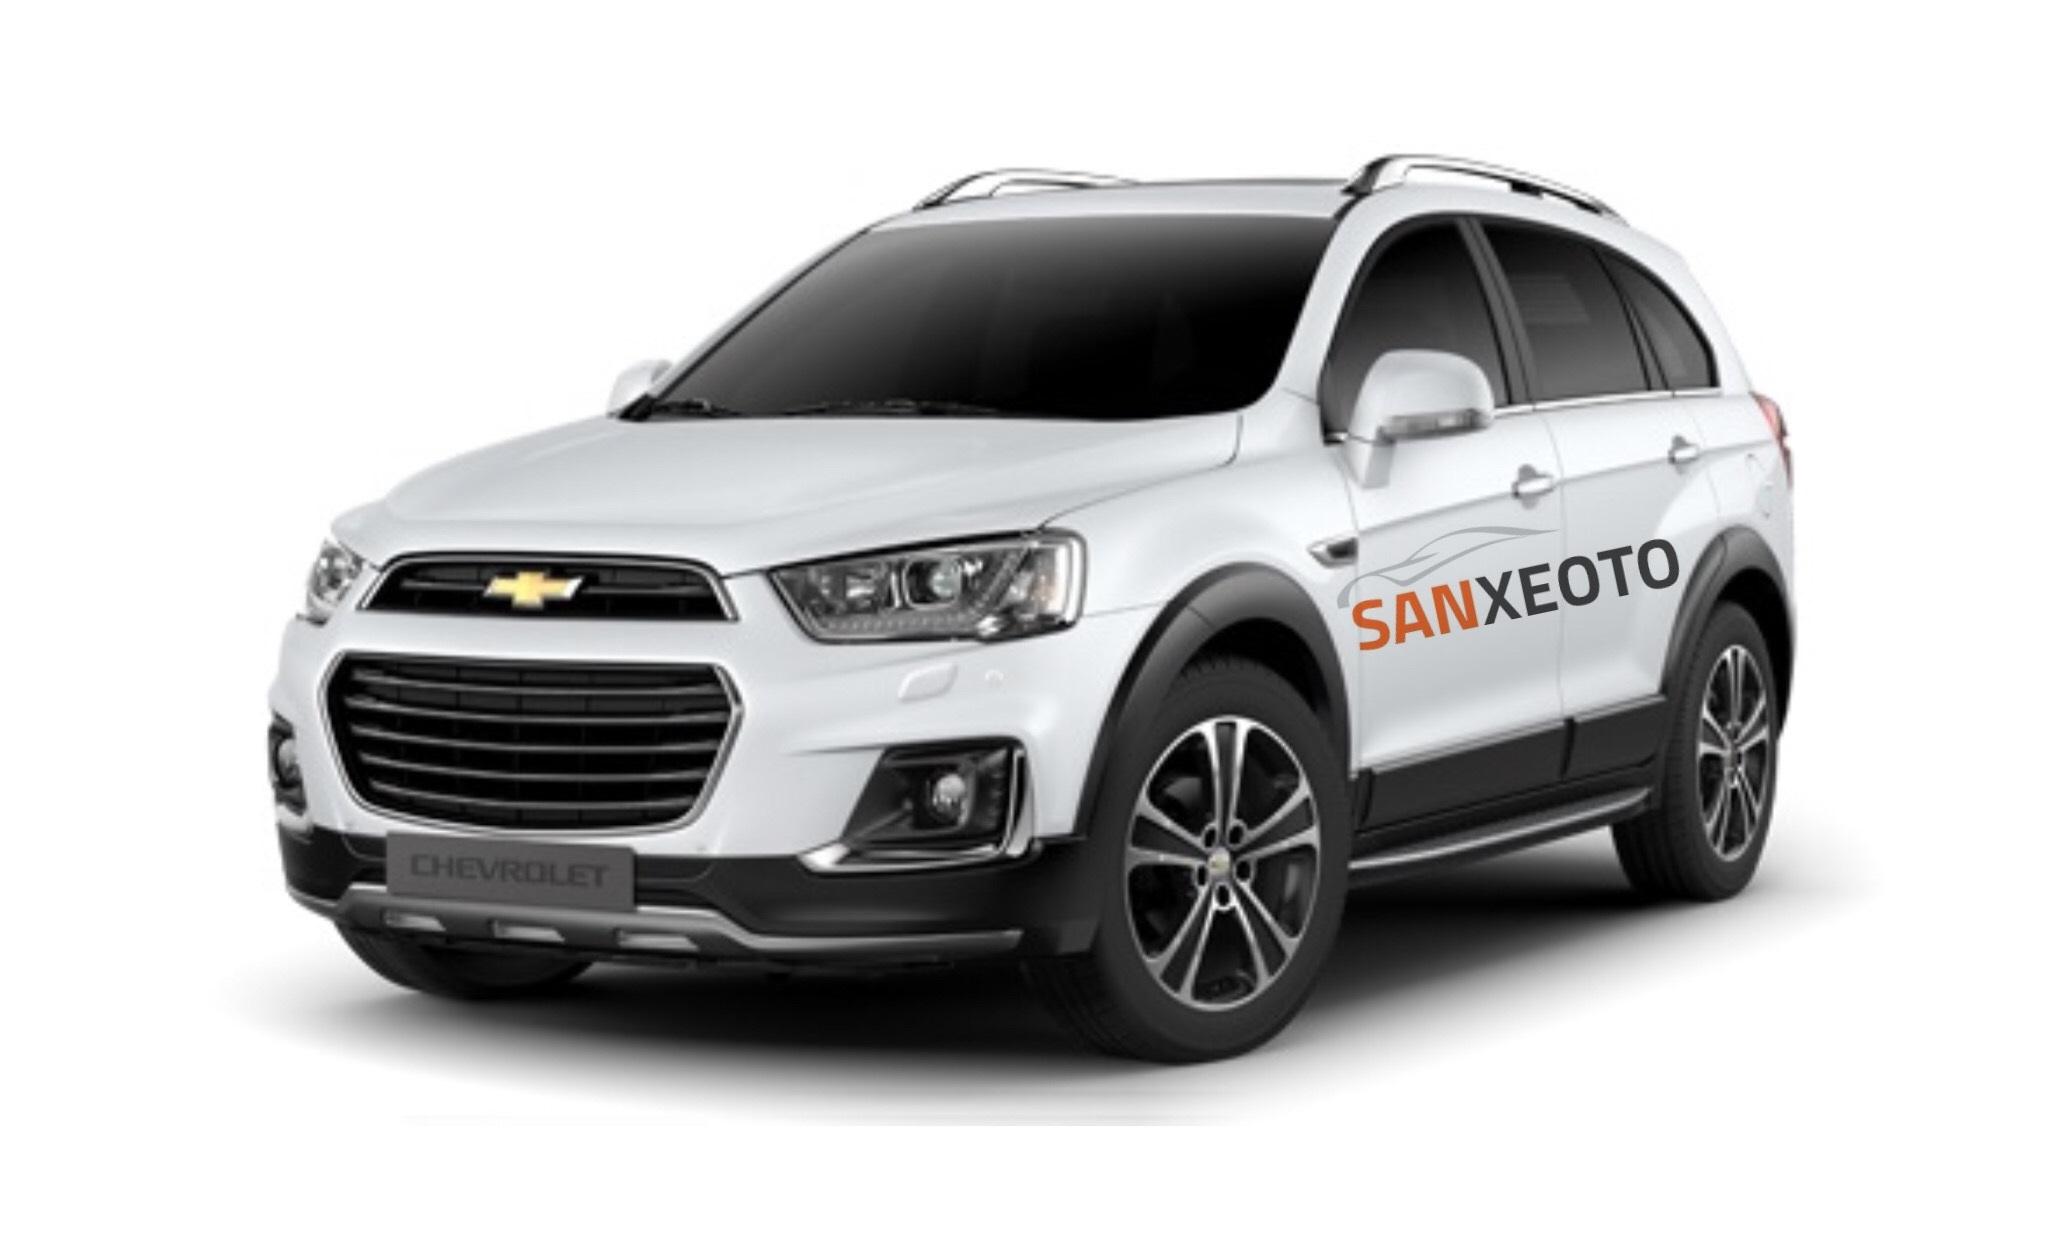 Suv có giá chưa đến 1 tỷ Chevrolet Captiva Revv